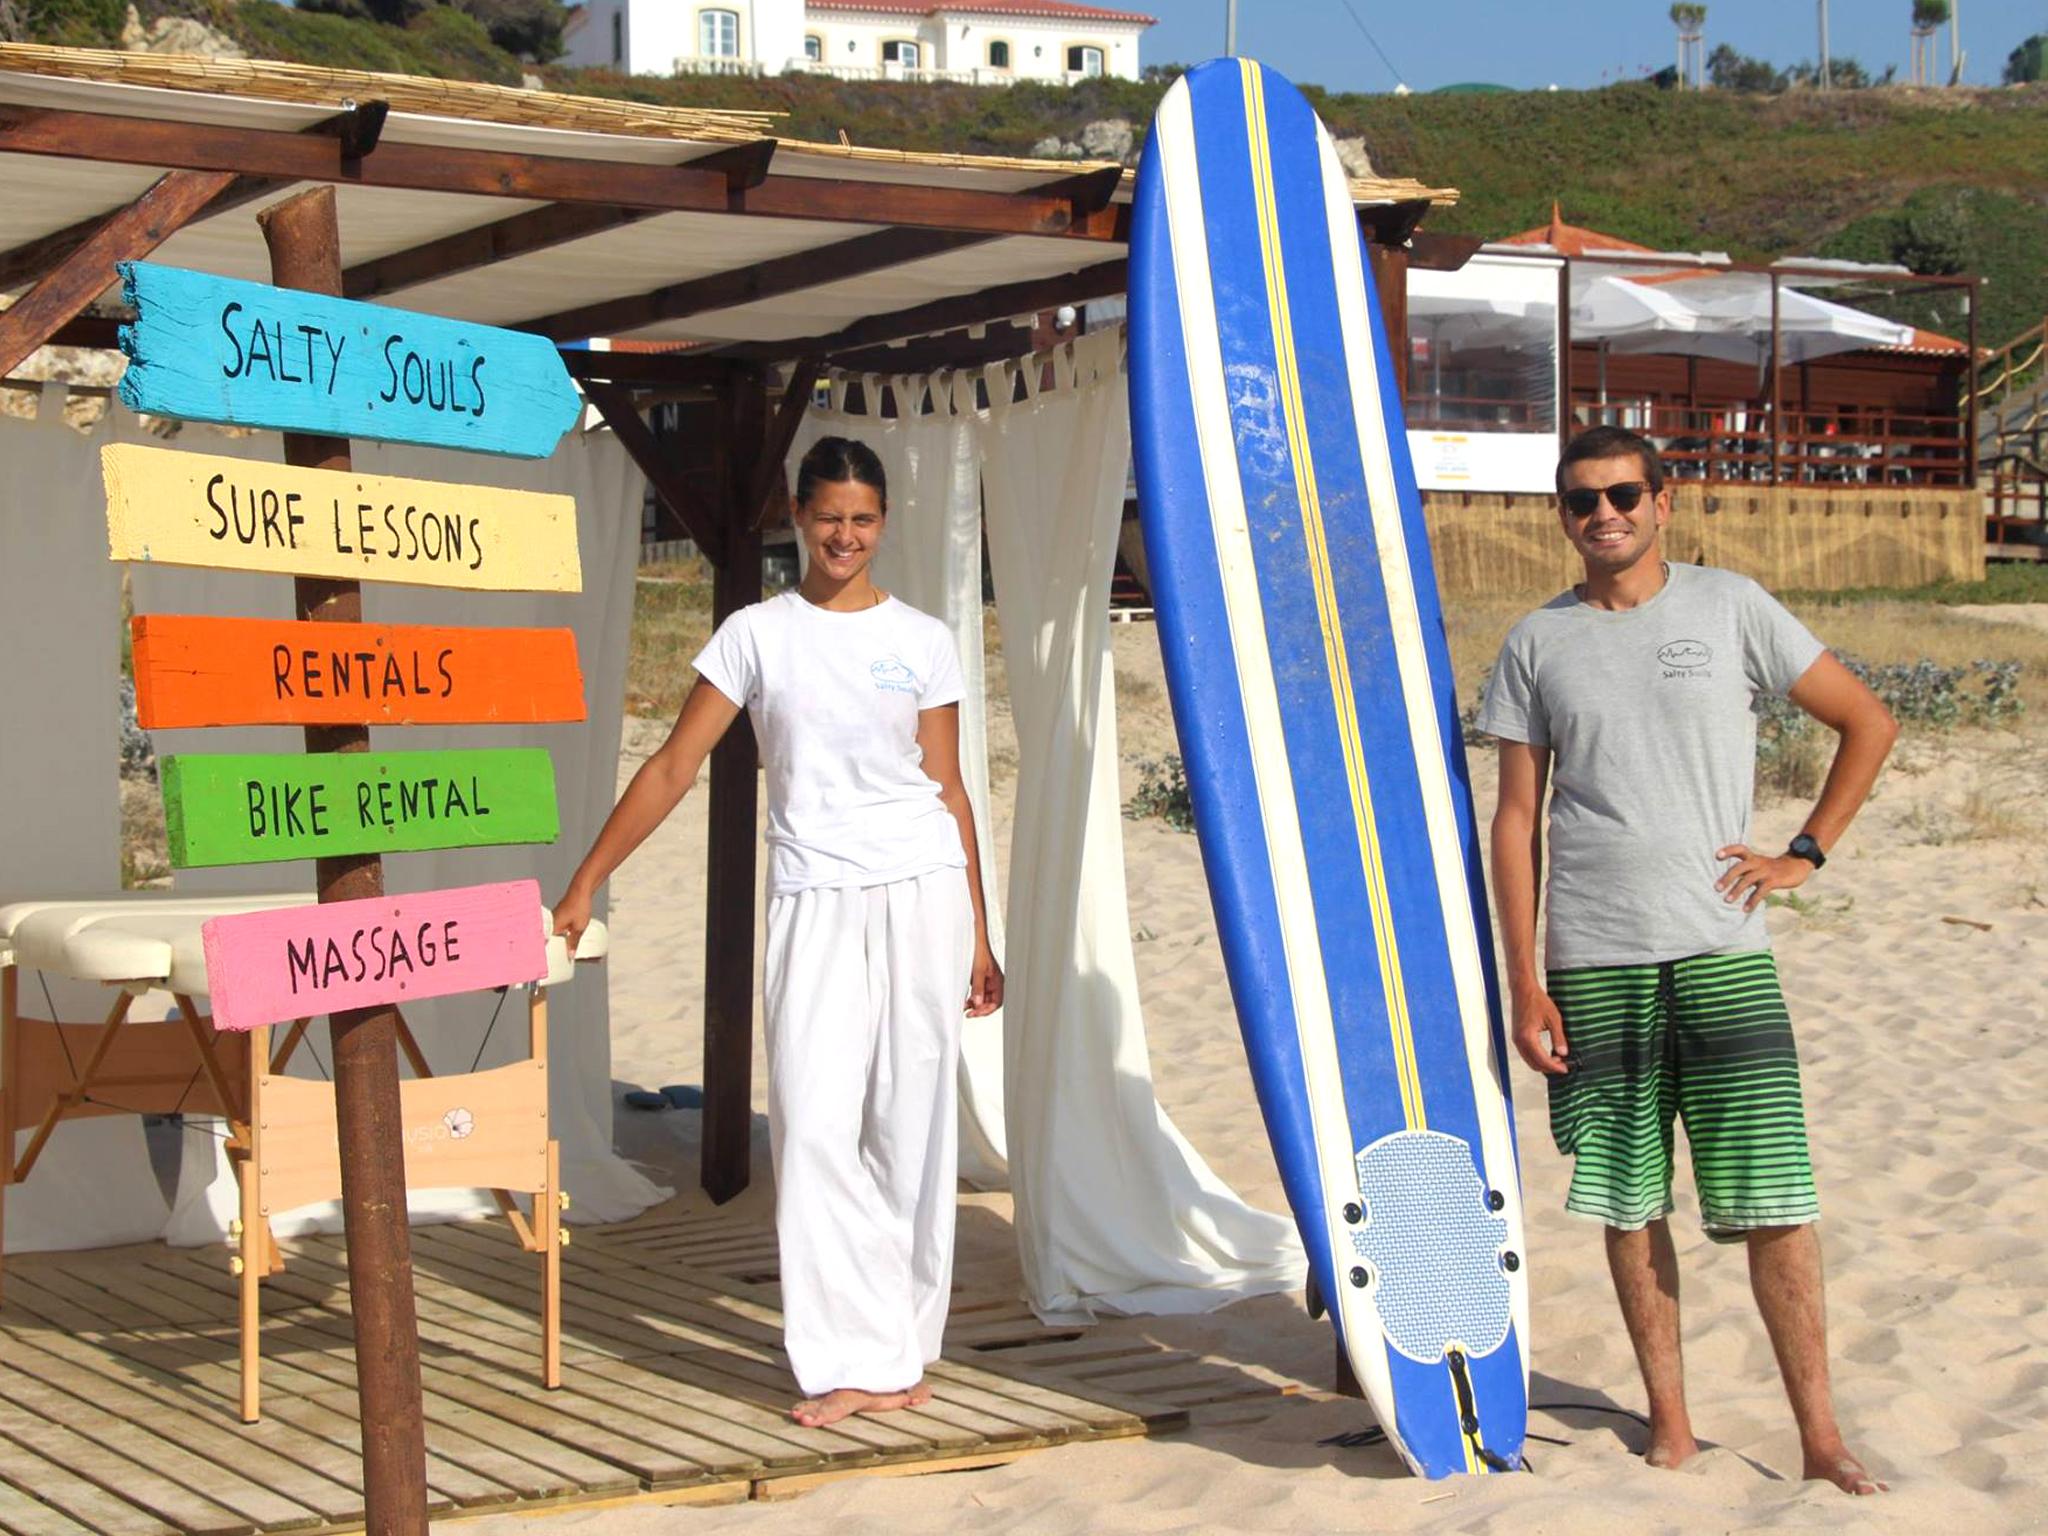 Actividades, Lazer, Salty Souls Surf School & Camp